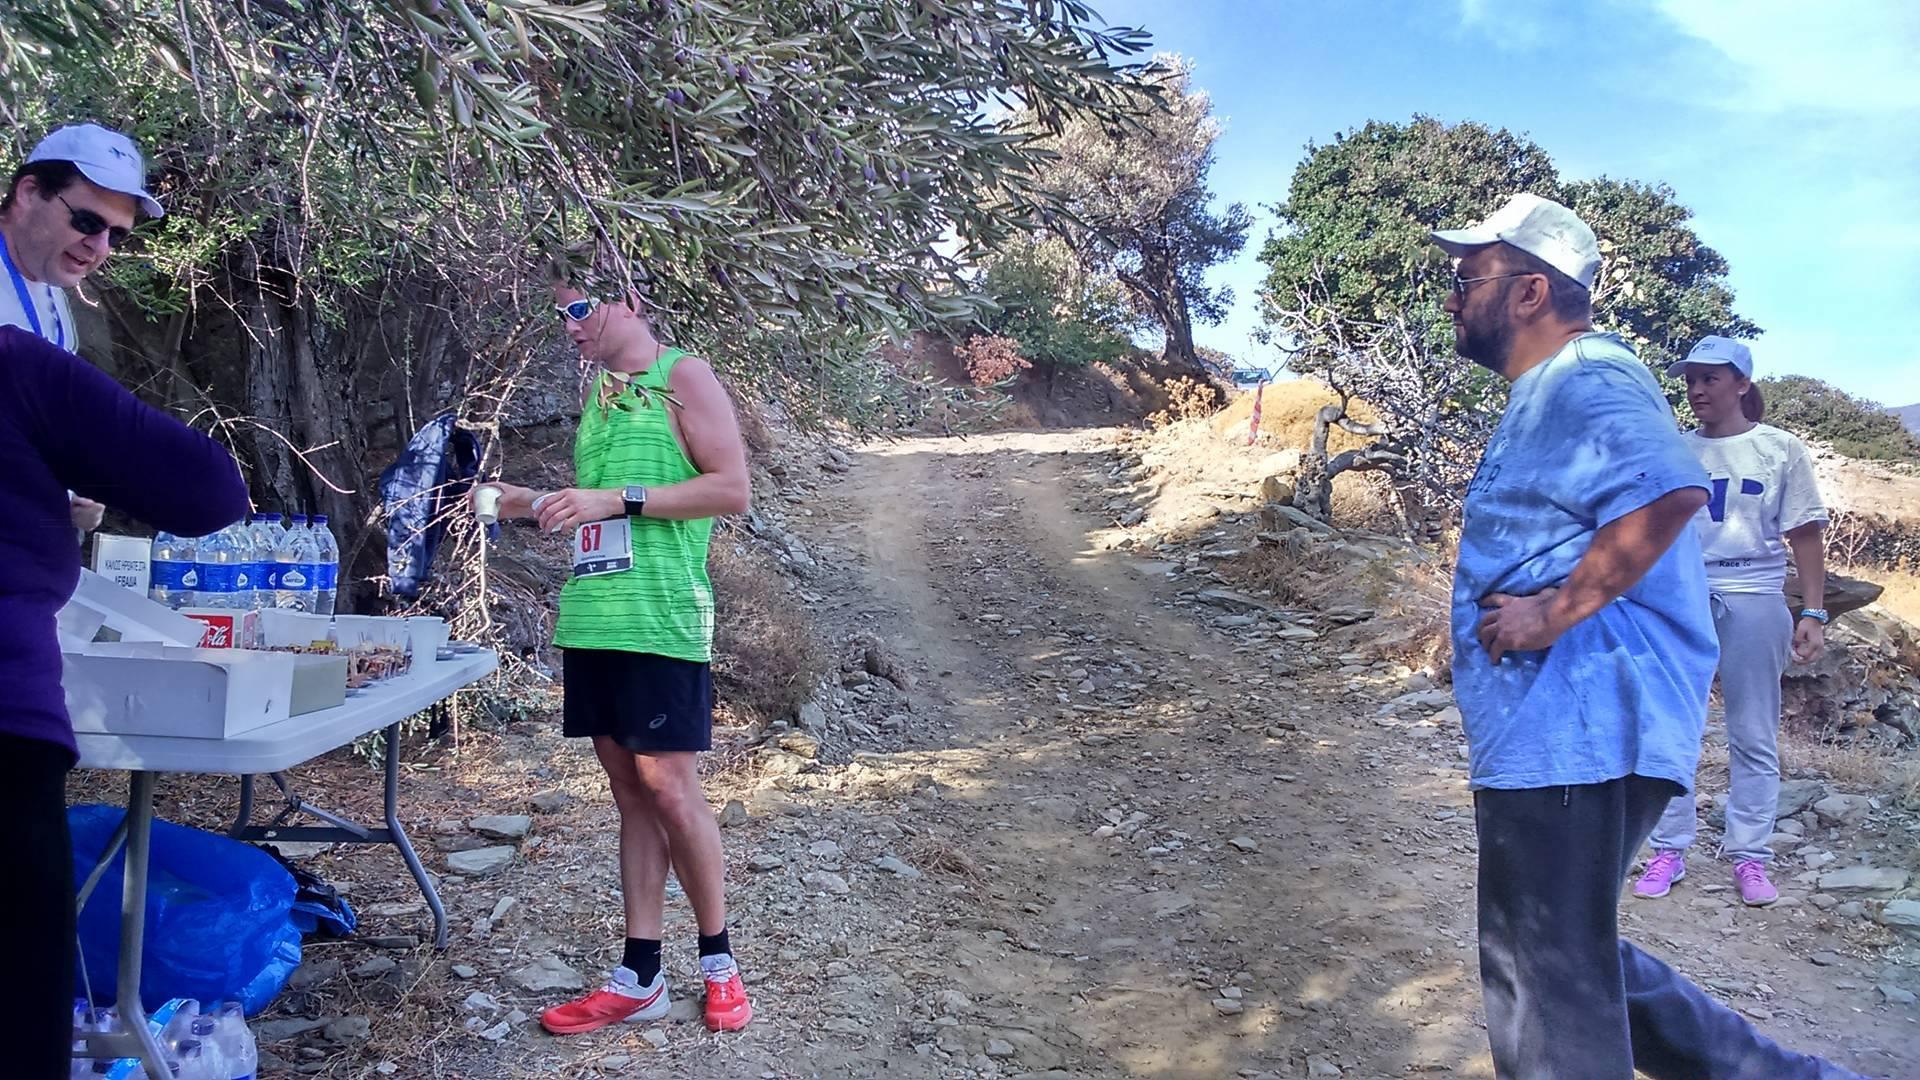 andros-trail-race-leivadia-station-2-oct-hariclia-daniolou-fotos-6